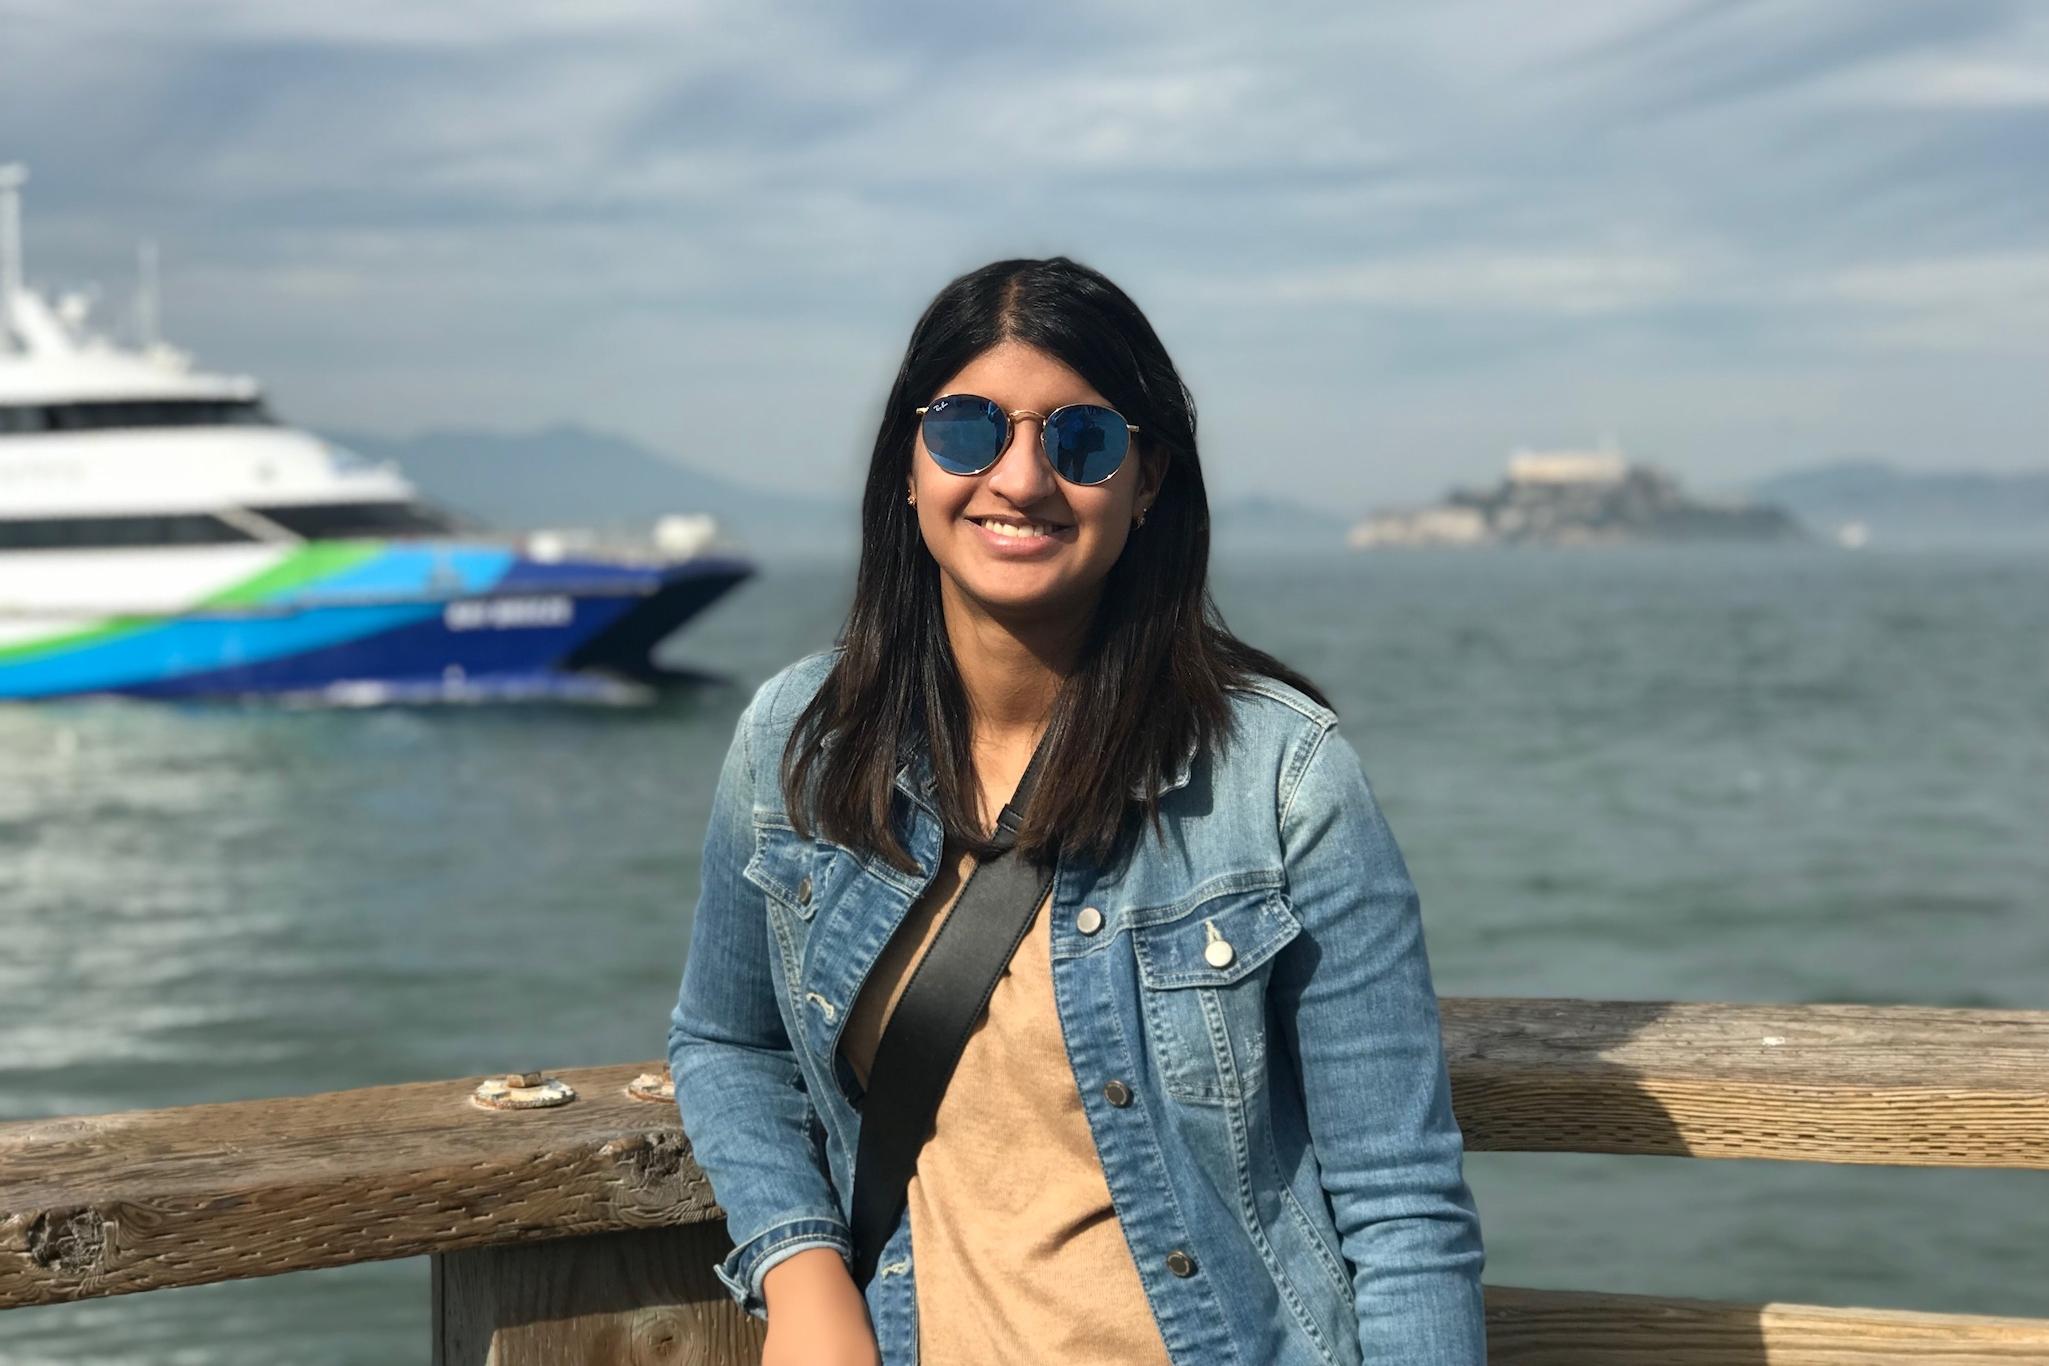 Dr. Zahra Merali - @MeraliZahraSeries DeveloperPGY2, Internal MedicineMcMaster University